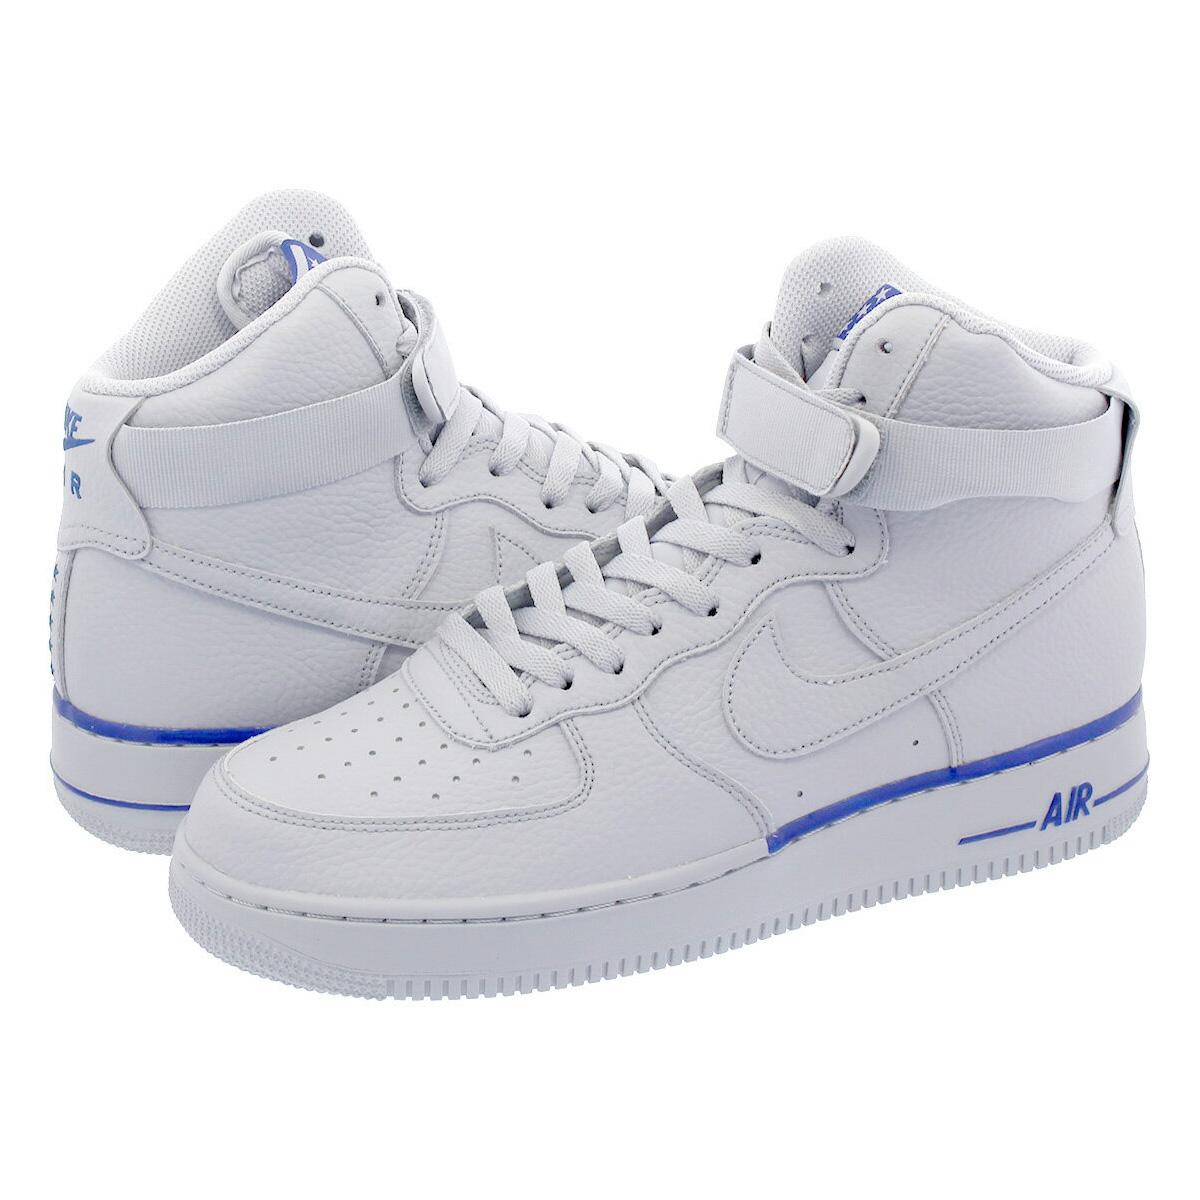 promo code 02fee 83ae1 SELECT SHOP LOWTEX  NIKE AIR FORCE 1 HIGH 07 Nike air force 1 high 07 WOLF  GREY DEEP ROYAL 315,121-045   Rakuten Global Market